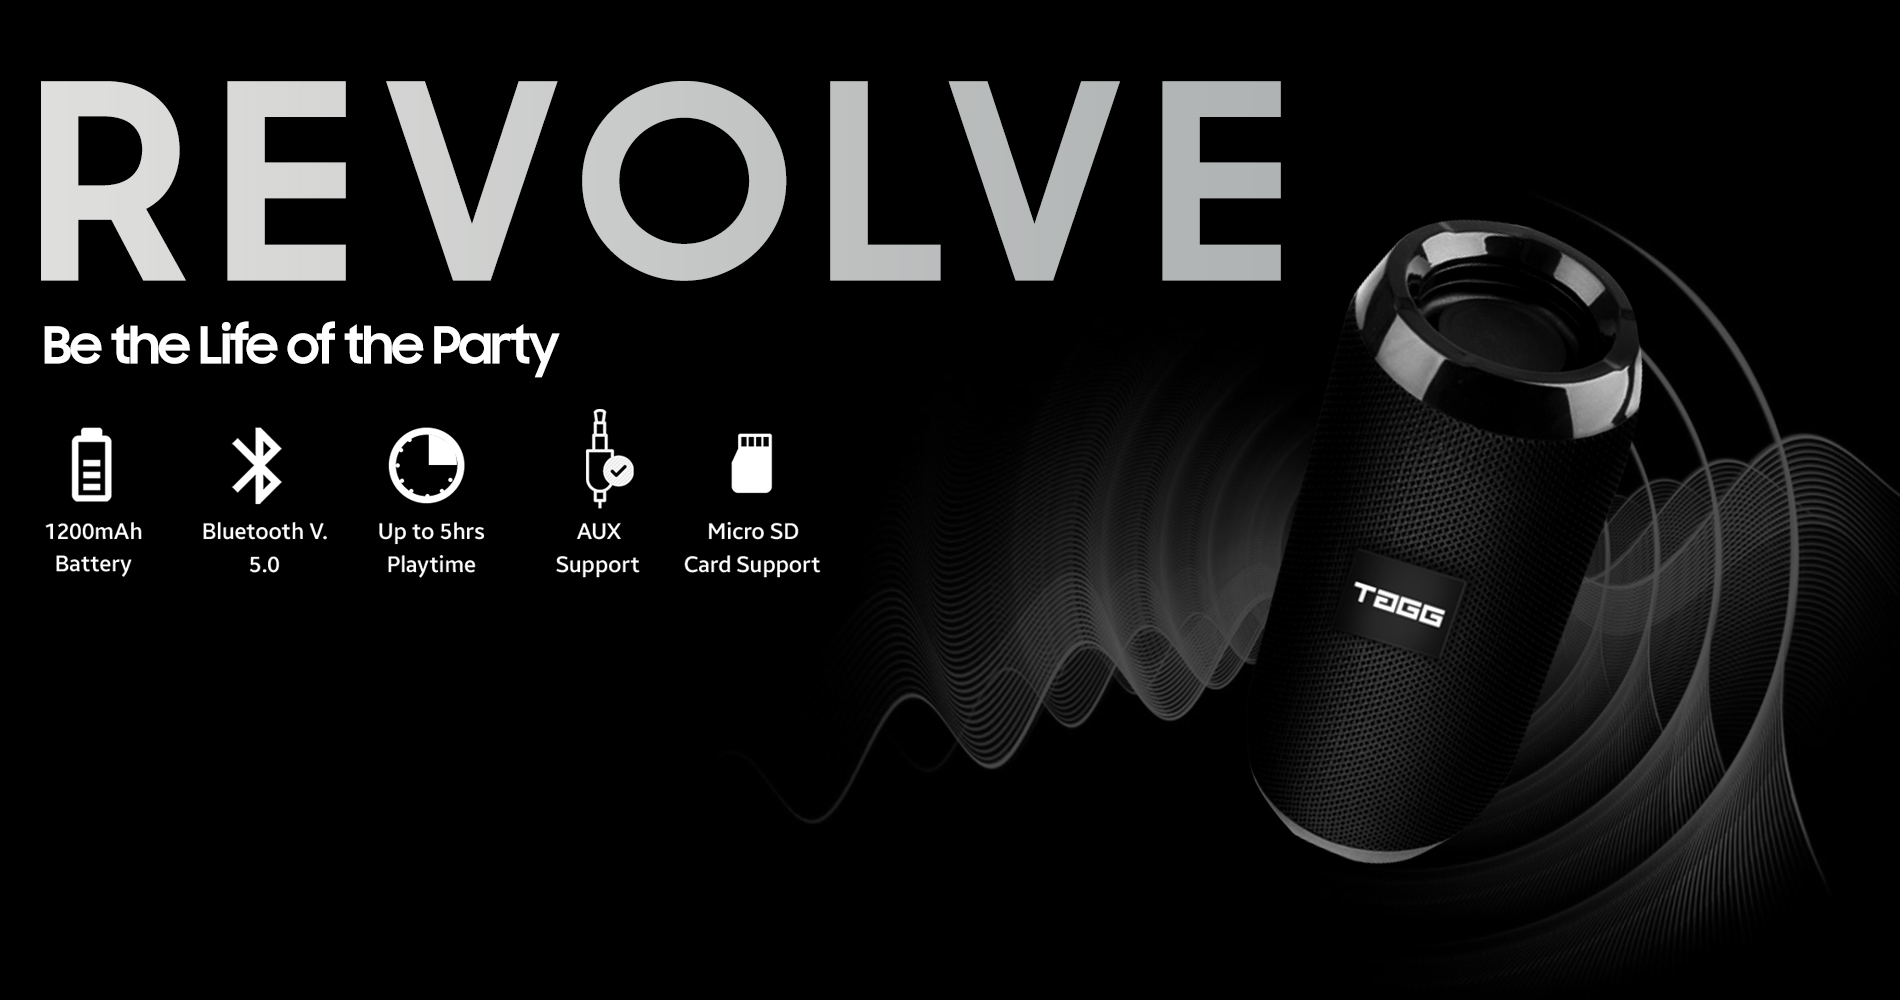 Revolve Portable Bluetooth Speaker